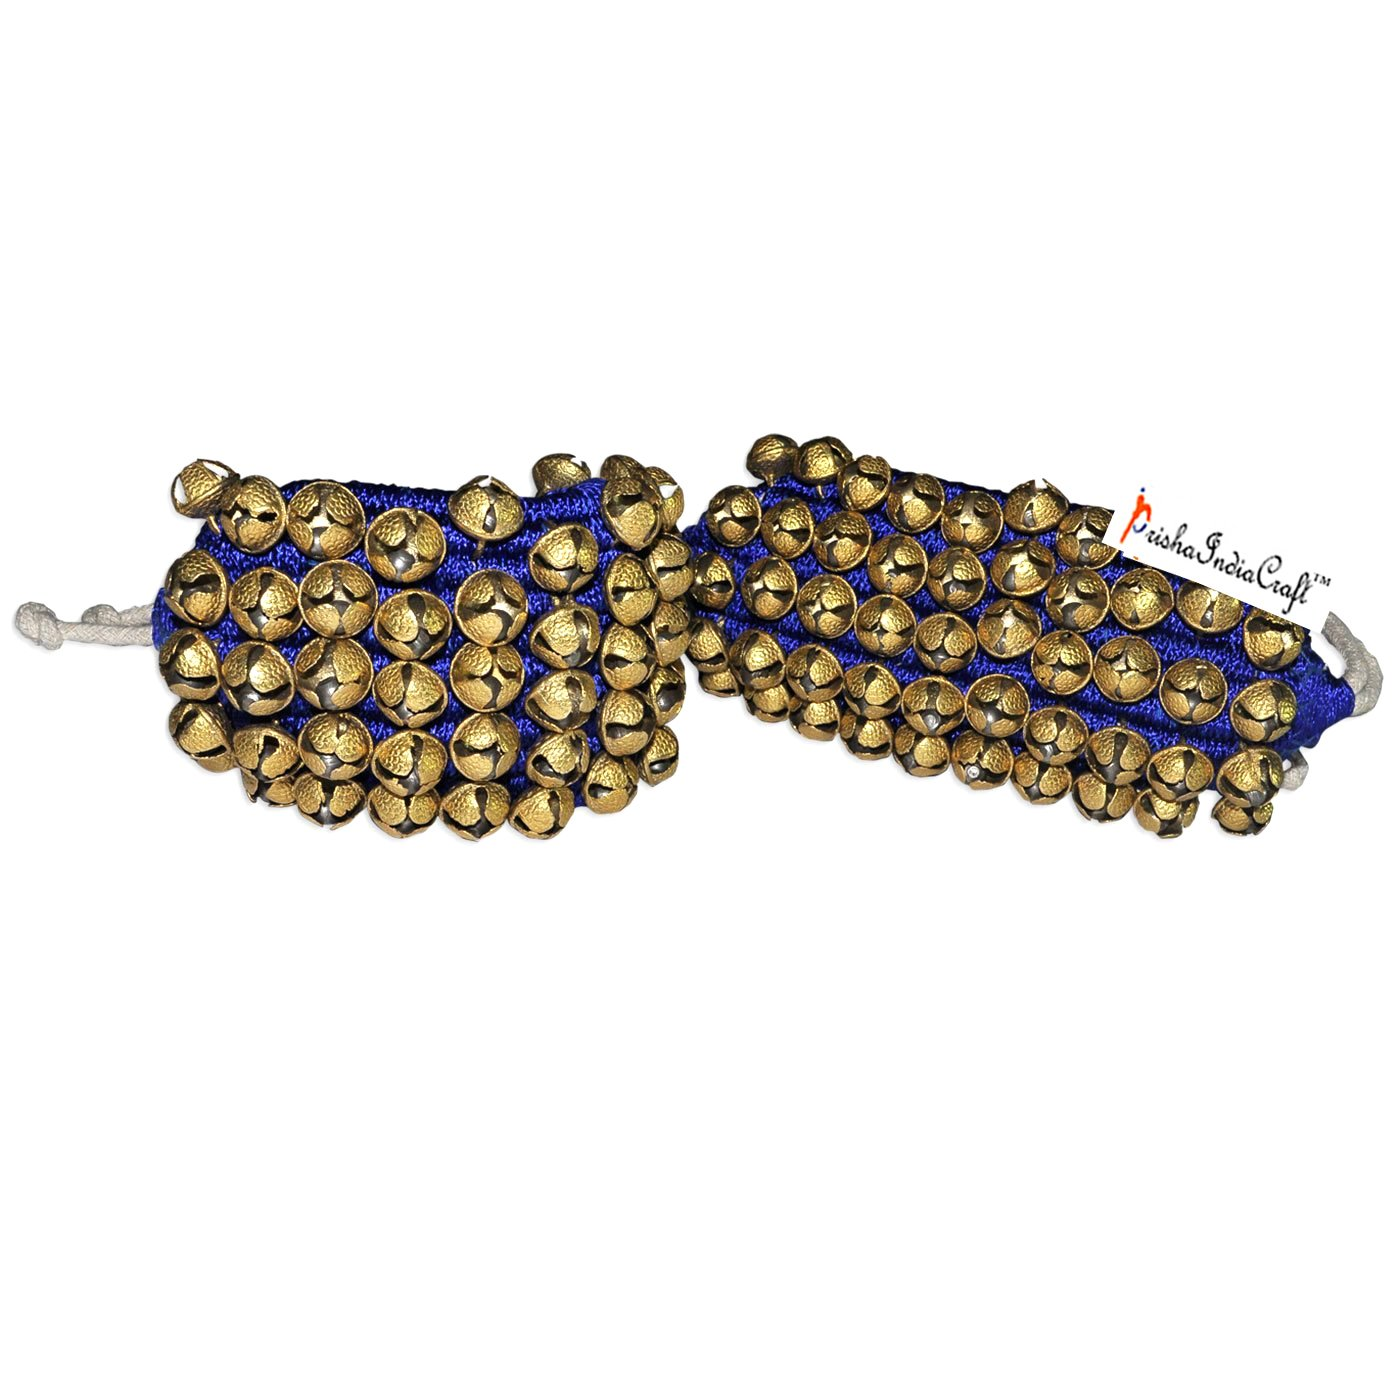 Prisha India Craft Kathak (5) Five Line Big Bells (16 No. Ghungroo) Good Quality Ghungroo Blue Pad Indian Classical Dancers Anklet Musical Instrument Bharatnatyam, Kuchipudi, Odissi Ghungru by Prisha India Craft